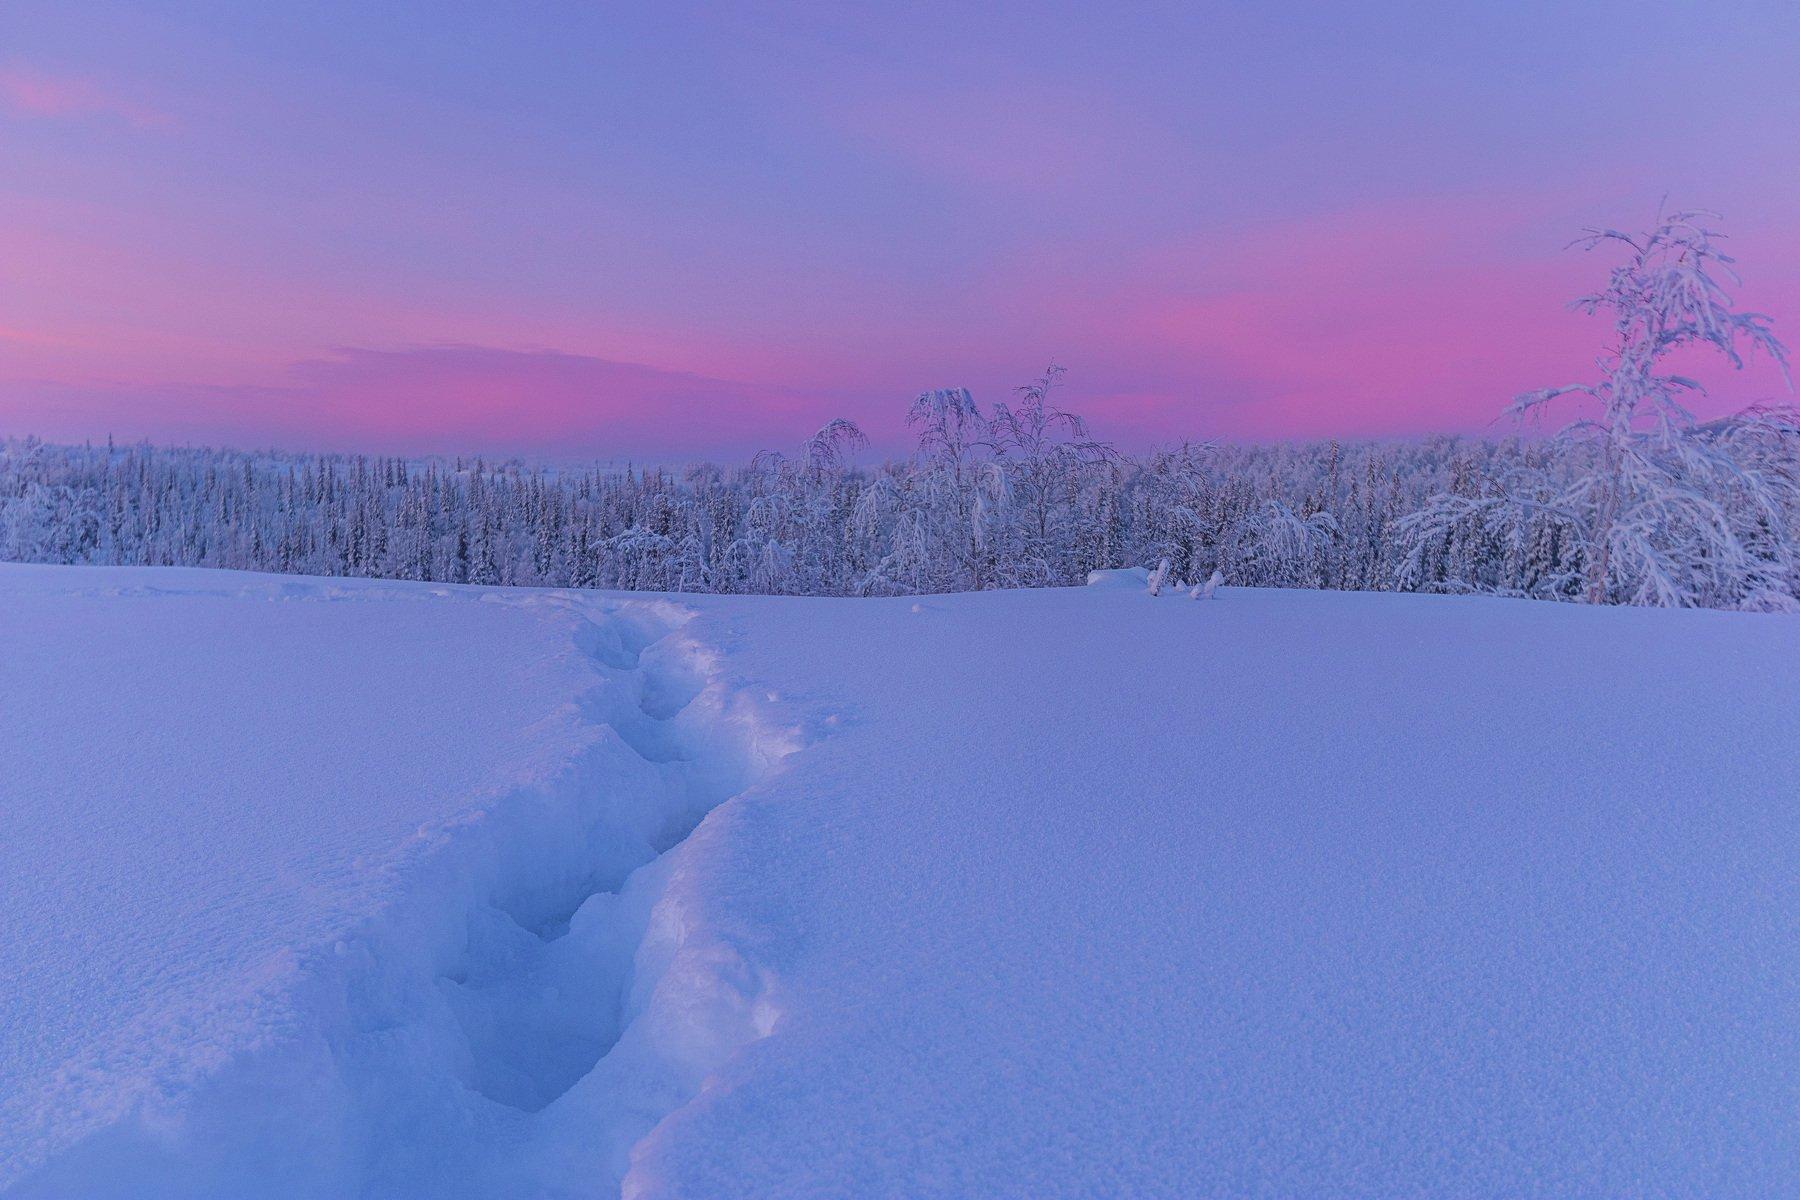 ямал , зима , природа, салехард , январь,  ямал ,север, Братцева Анастасия